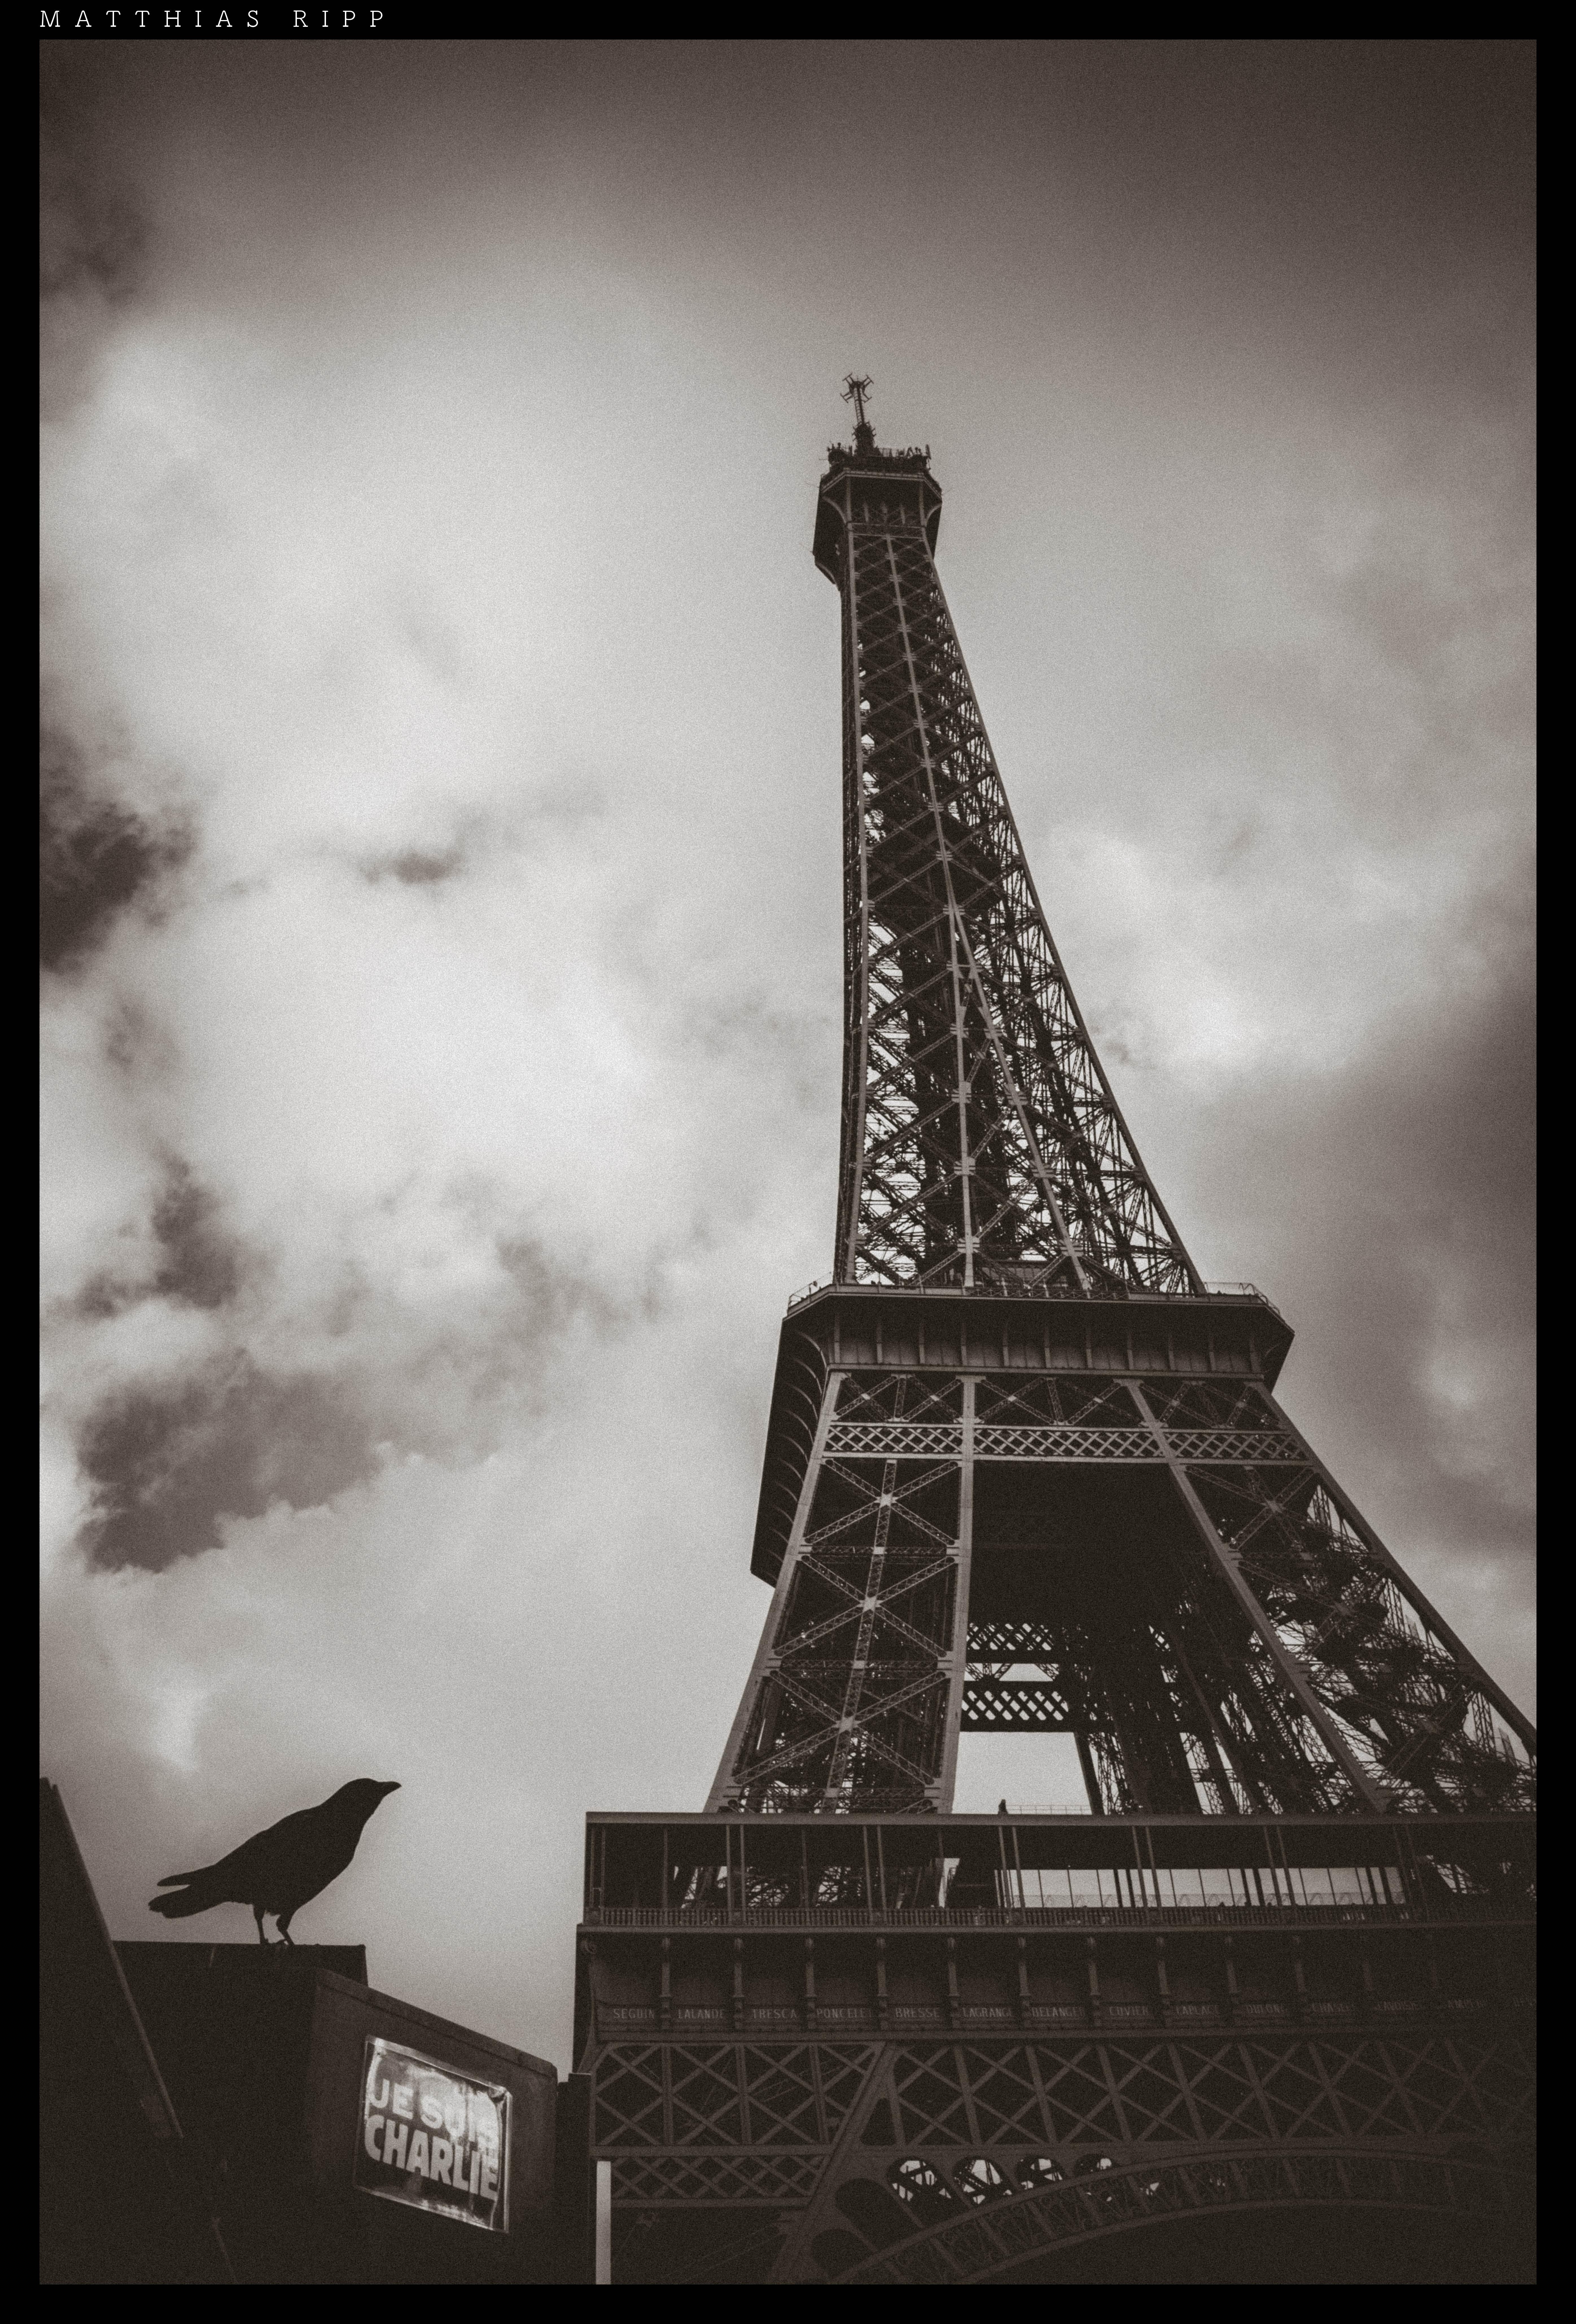 Free Images : black and white, sky, street, city, paris, skyscraper ...